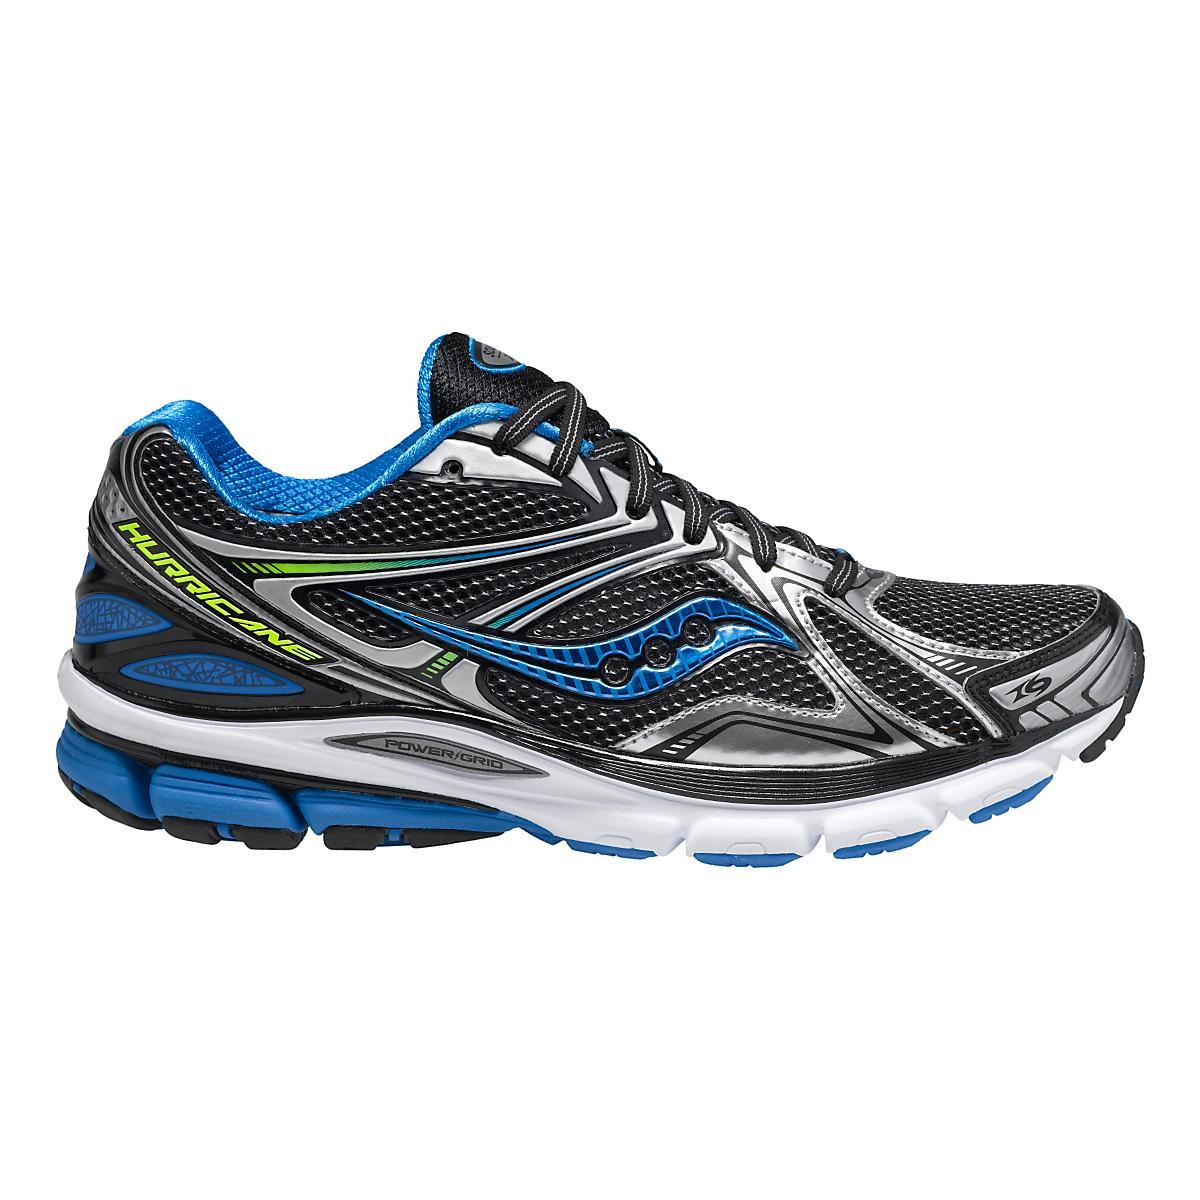 303ed0aa Mens Saucony Hurricane 16 Running Shoe at Road Runner Sports